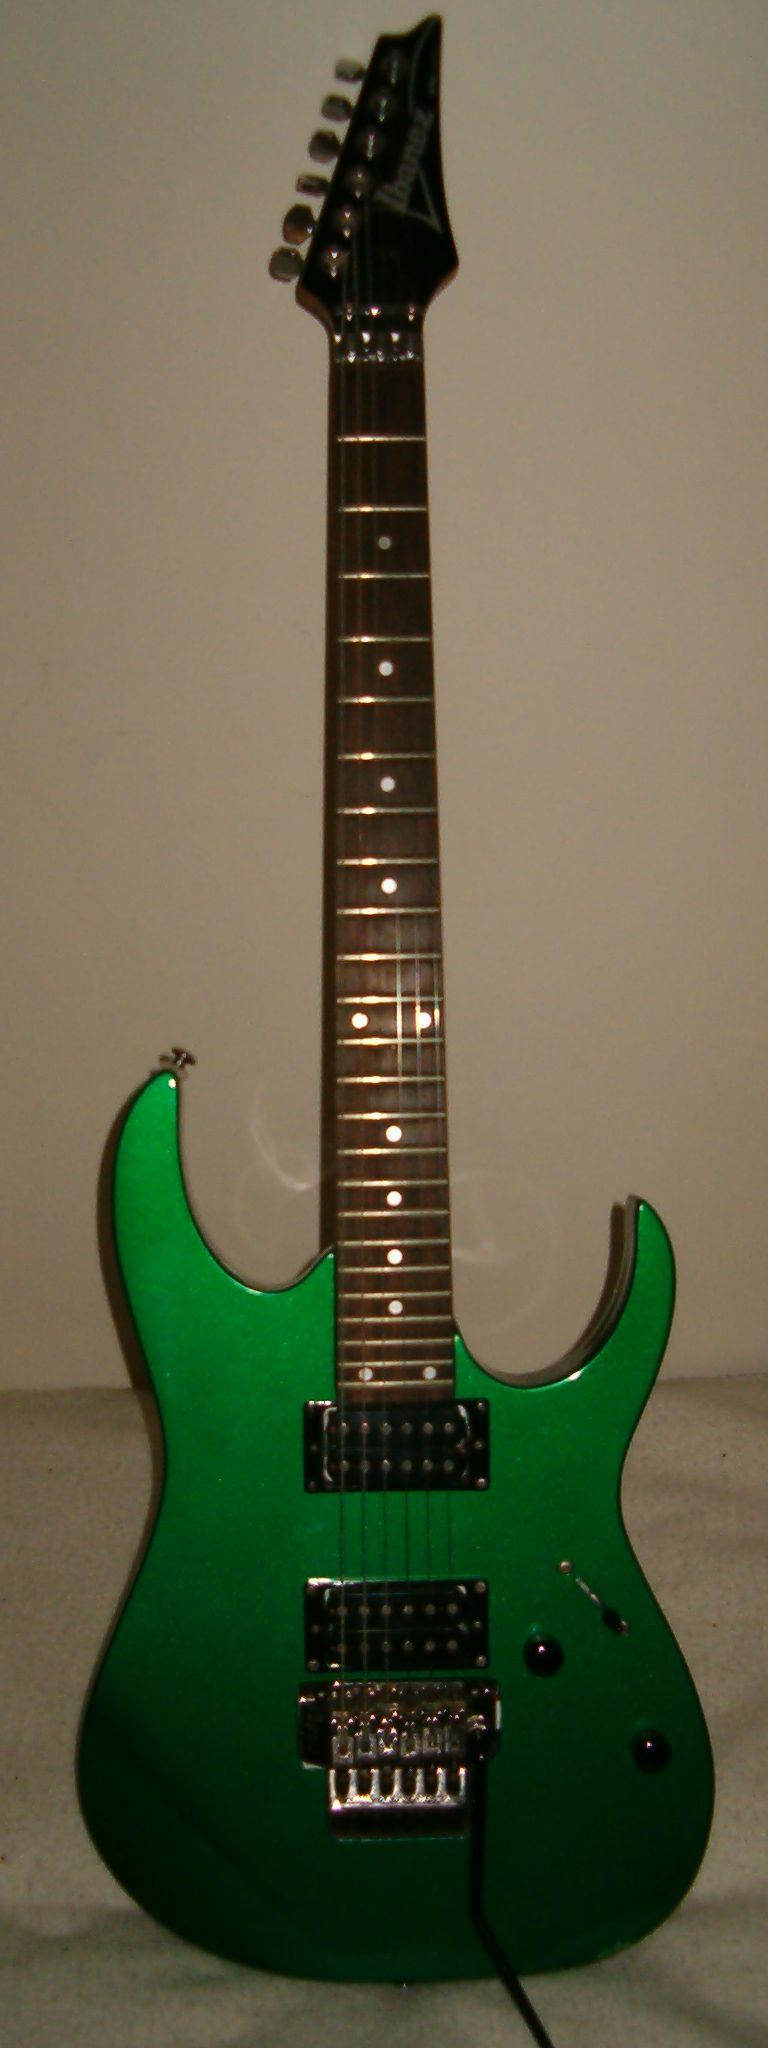 Ibanez-green-front.JPG